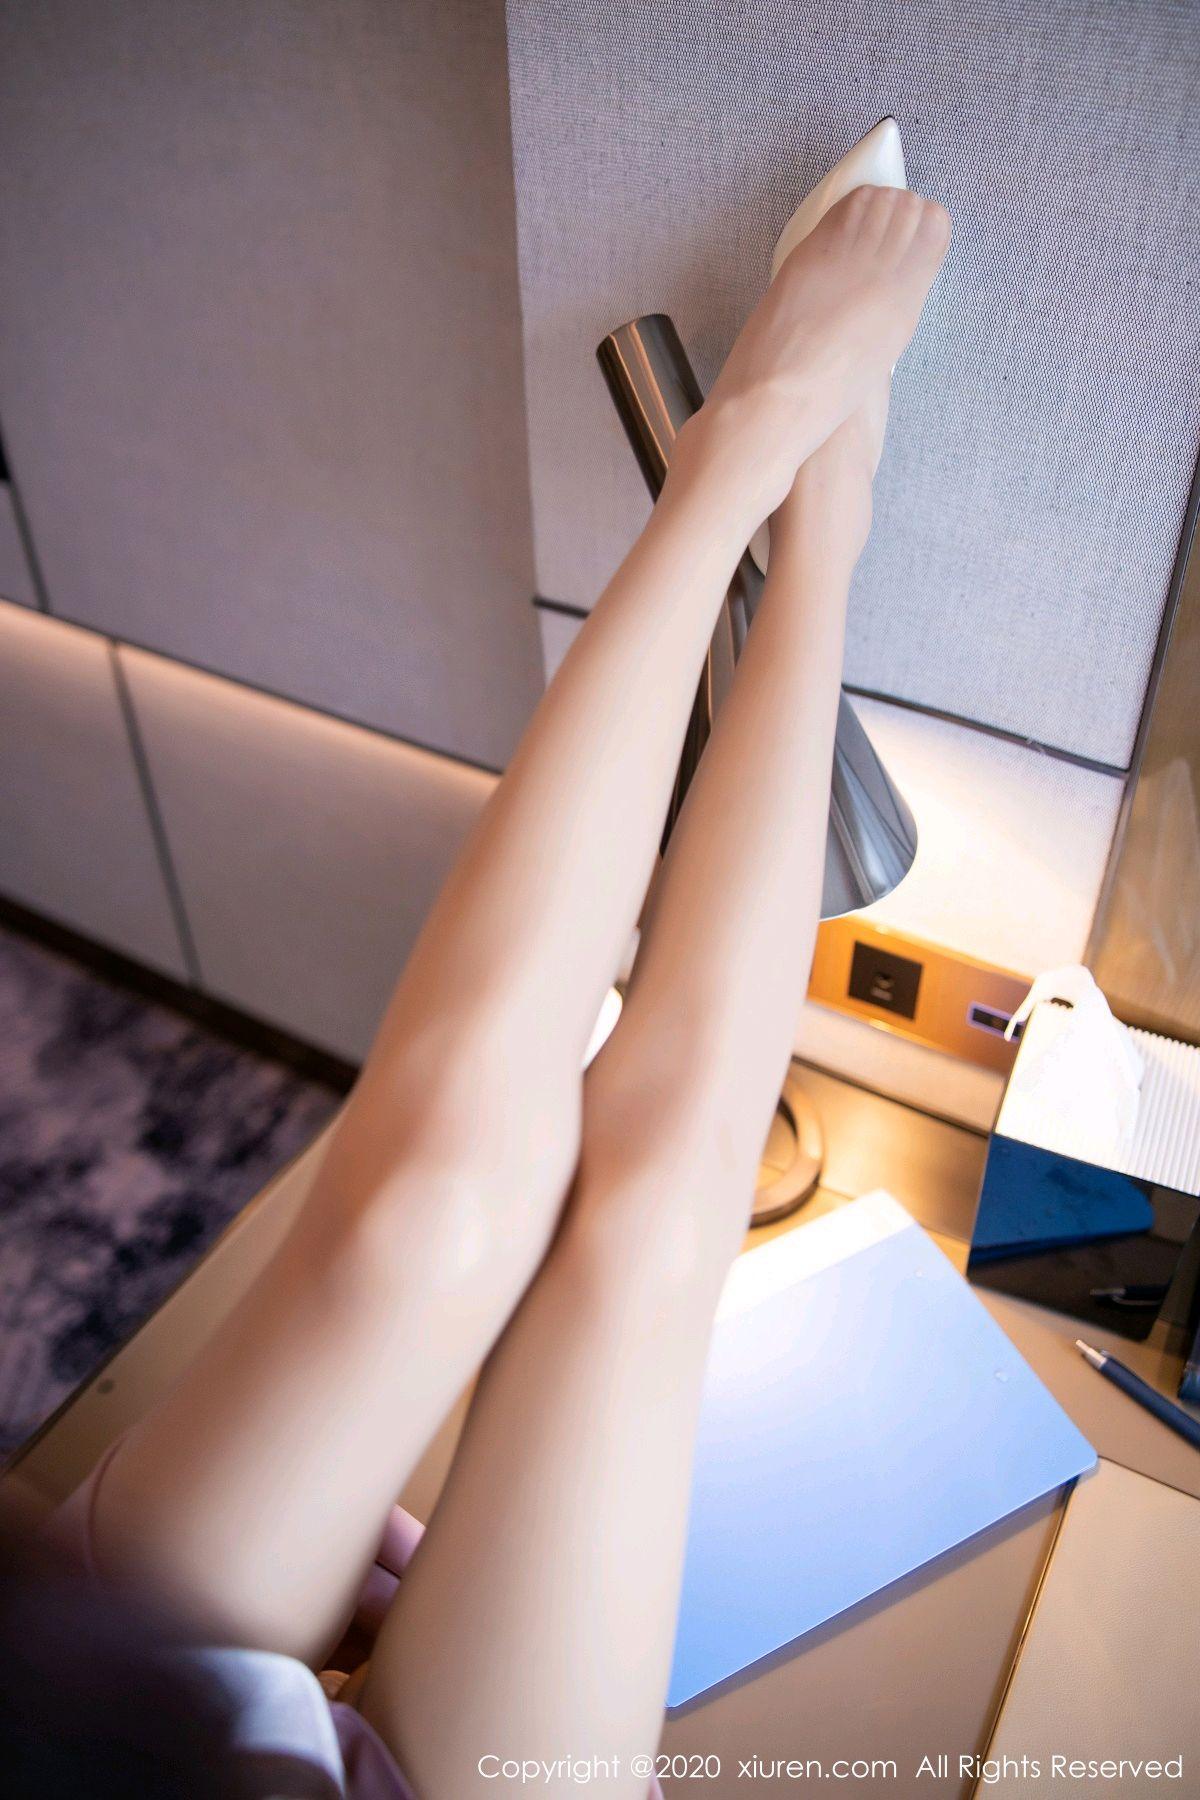 [XiuRen] Vol.2431 Yang Chen Chen 33P, Tall, Underwear, Uniform, Xiuren, Yang Chen Chen